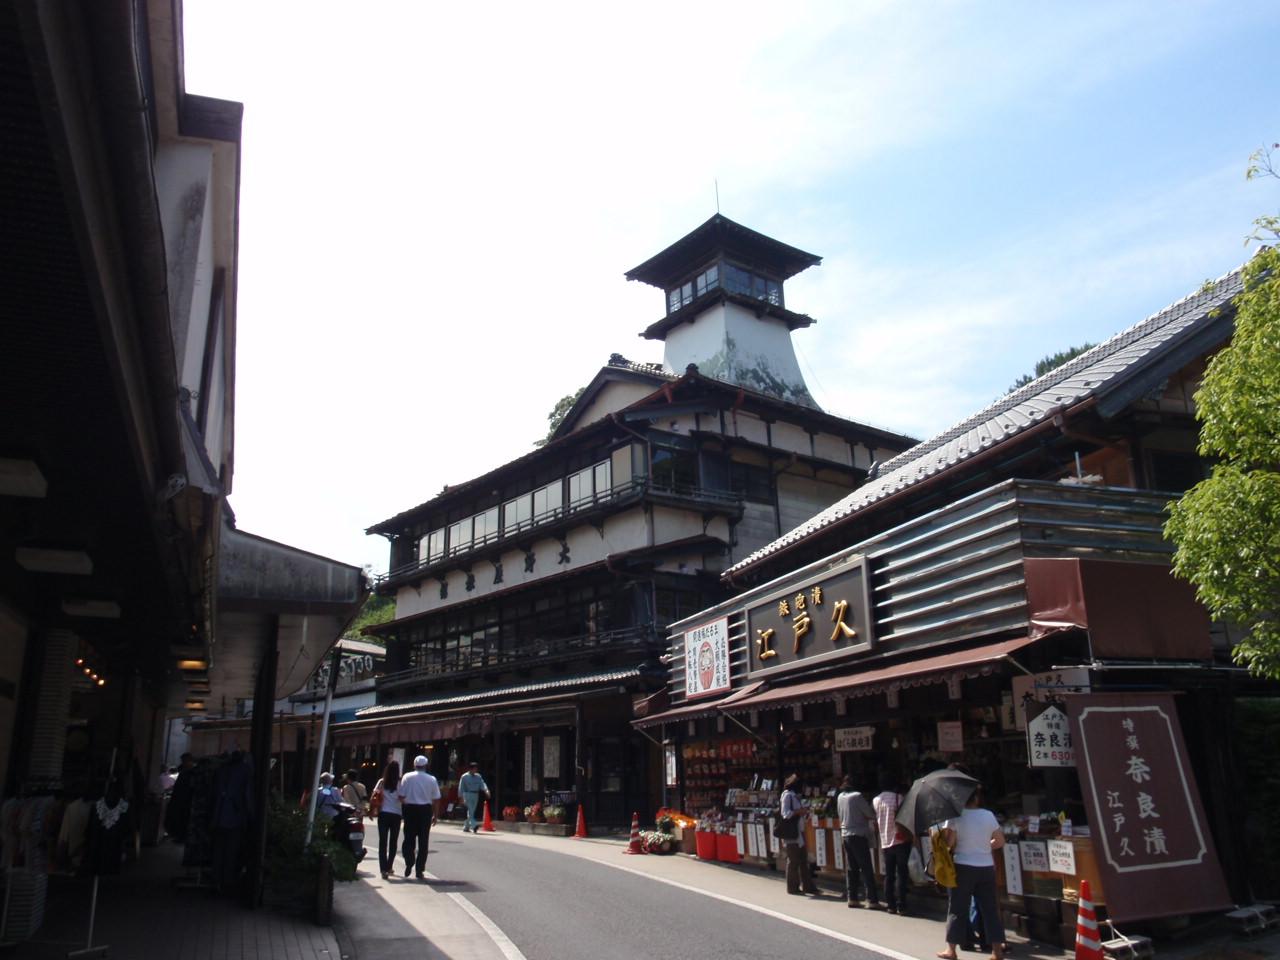 Best Tokyo Airport Hotels - Hotels Near Narita Airport (NRT)